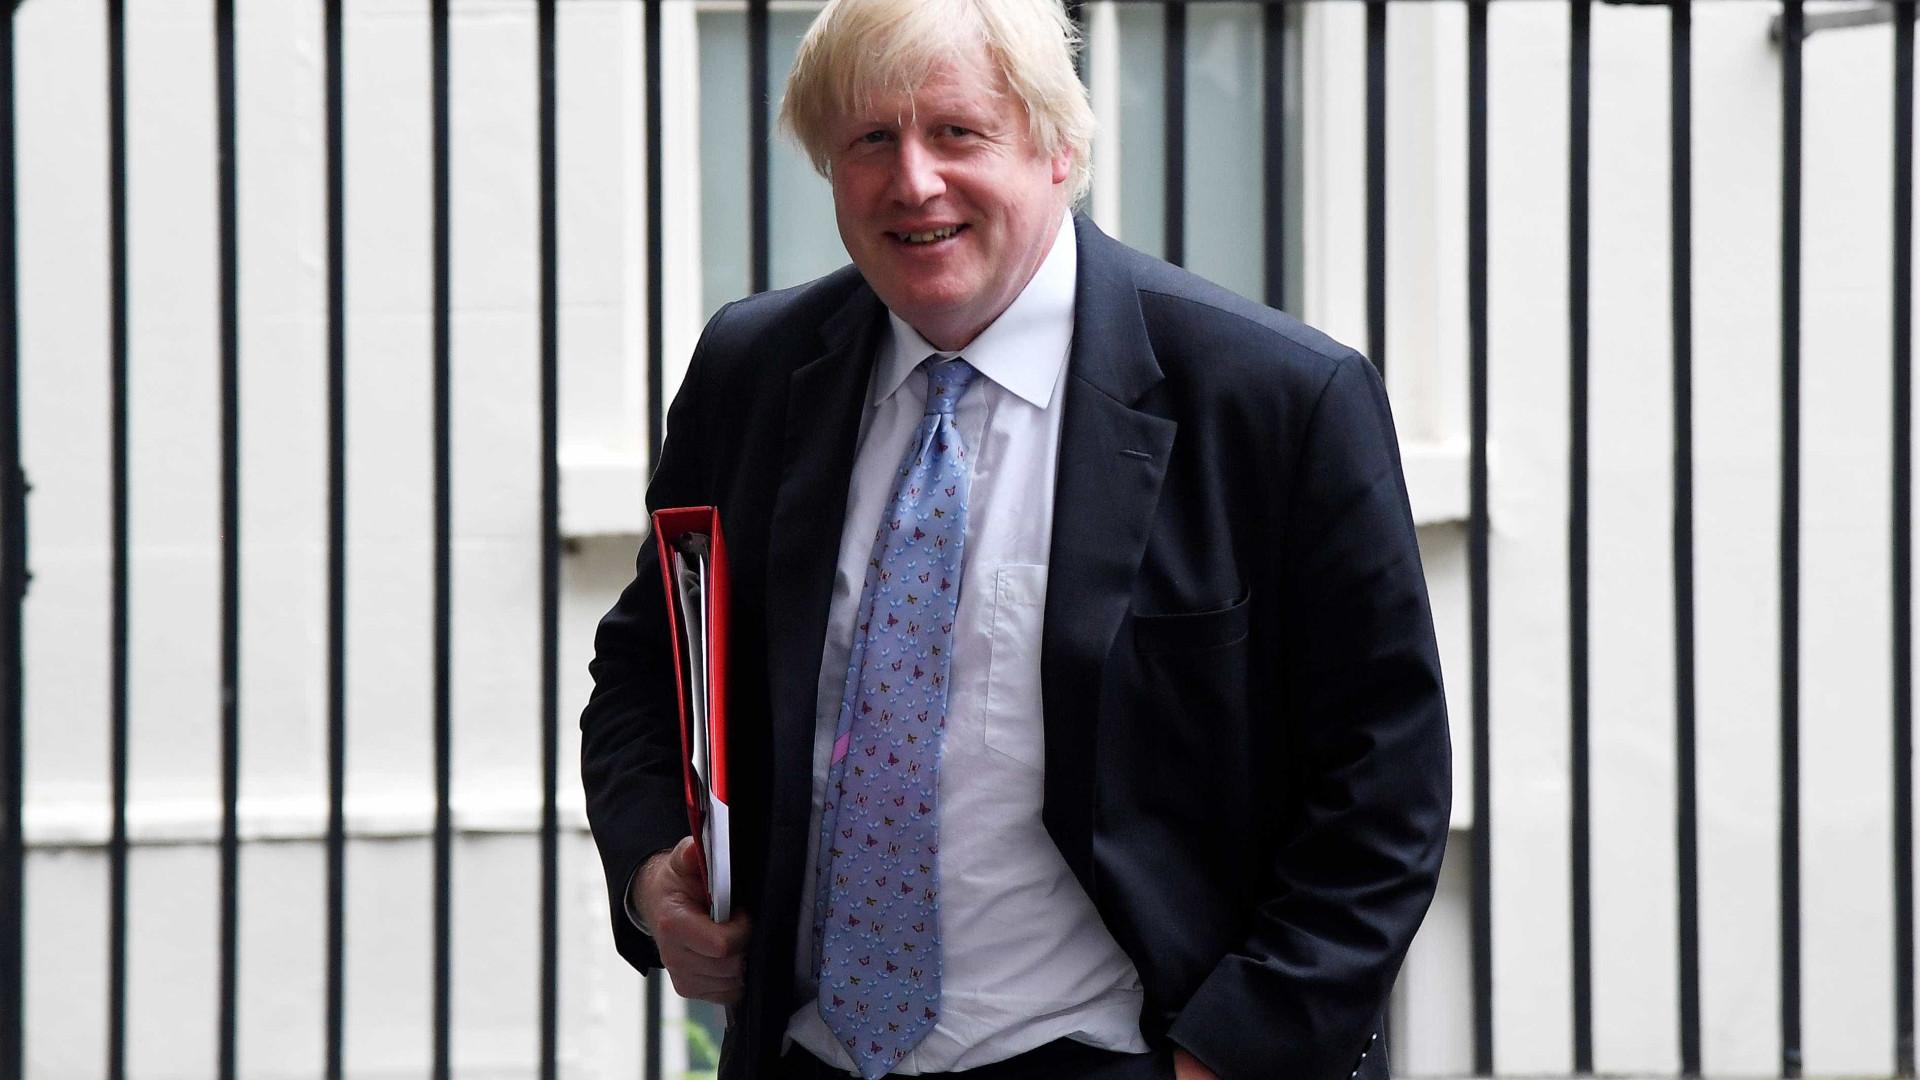 Trump negociaria 'brexit' melhor do que May, diz Boris Johnson